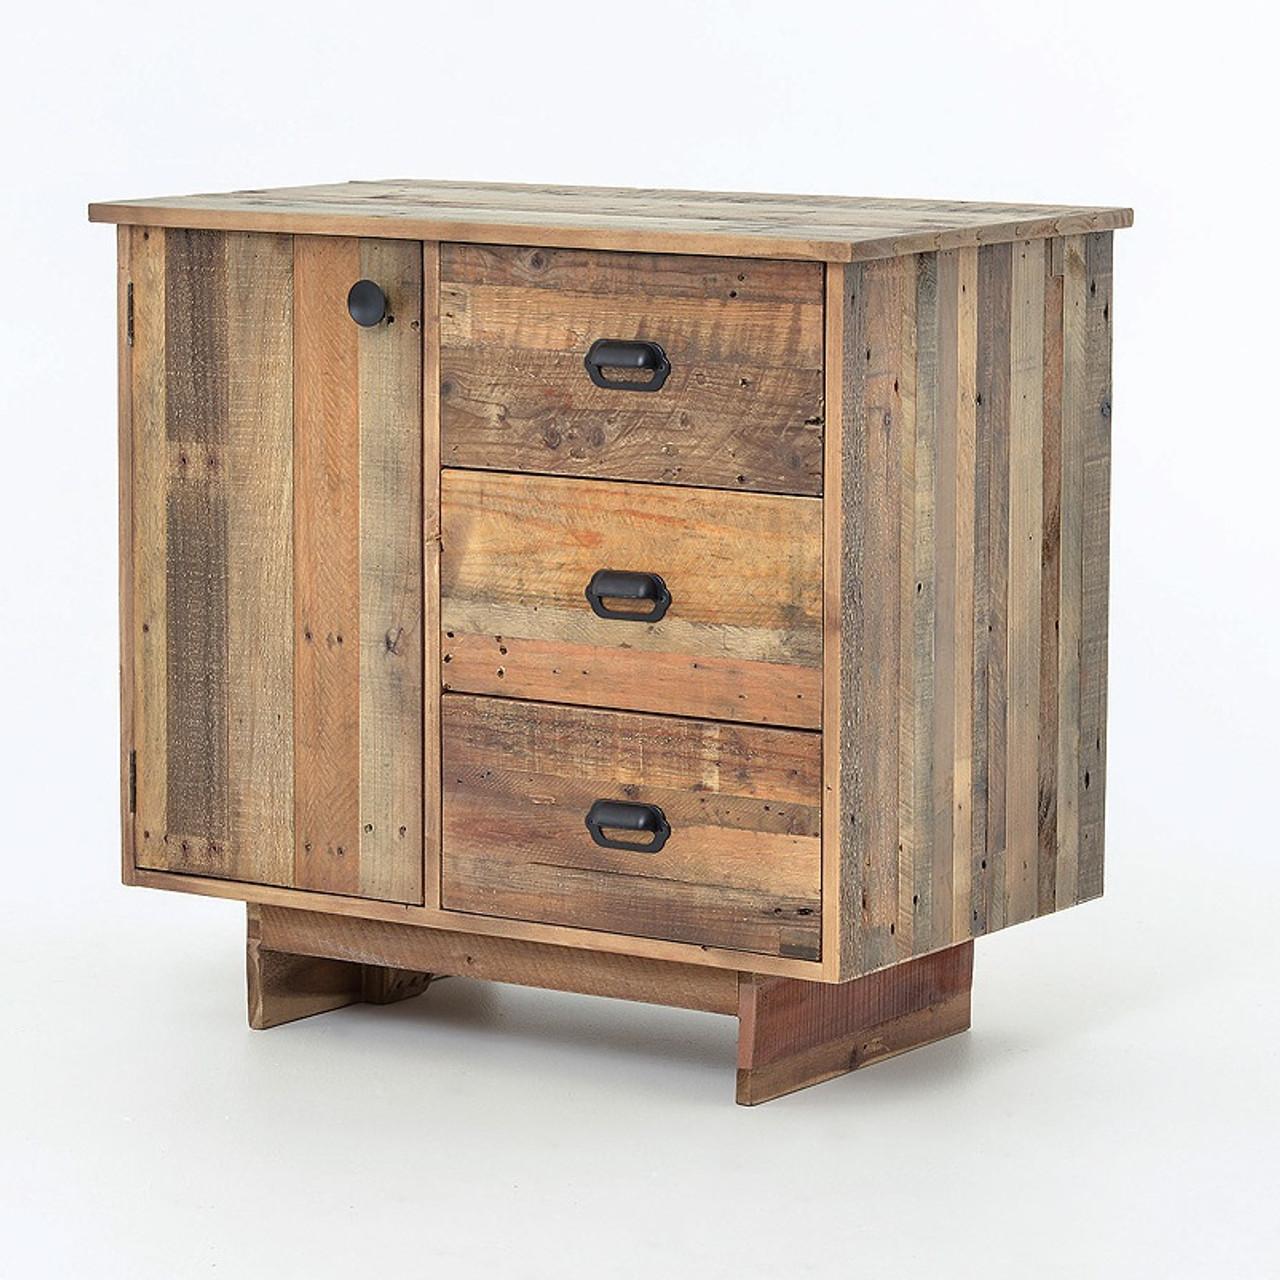 Angora Reclaimed Natural Wood Small Sideboard - Angora Reclaimed Natural Wood Small Sideboard Chest Zin Home